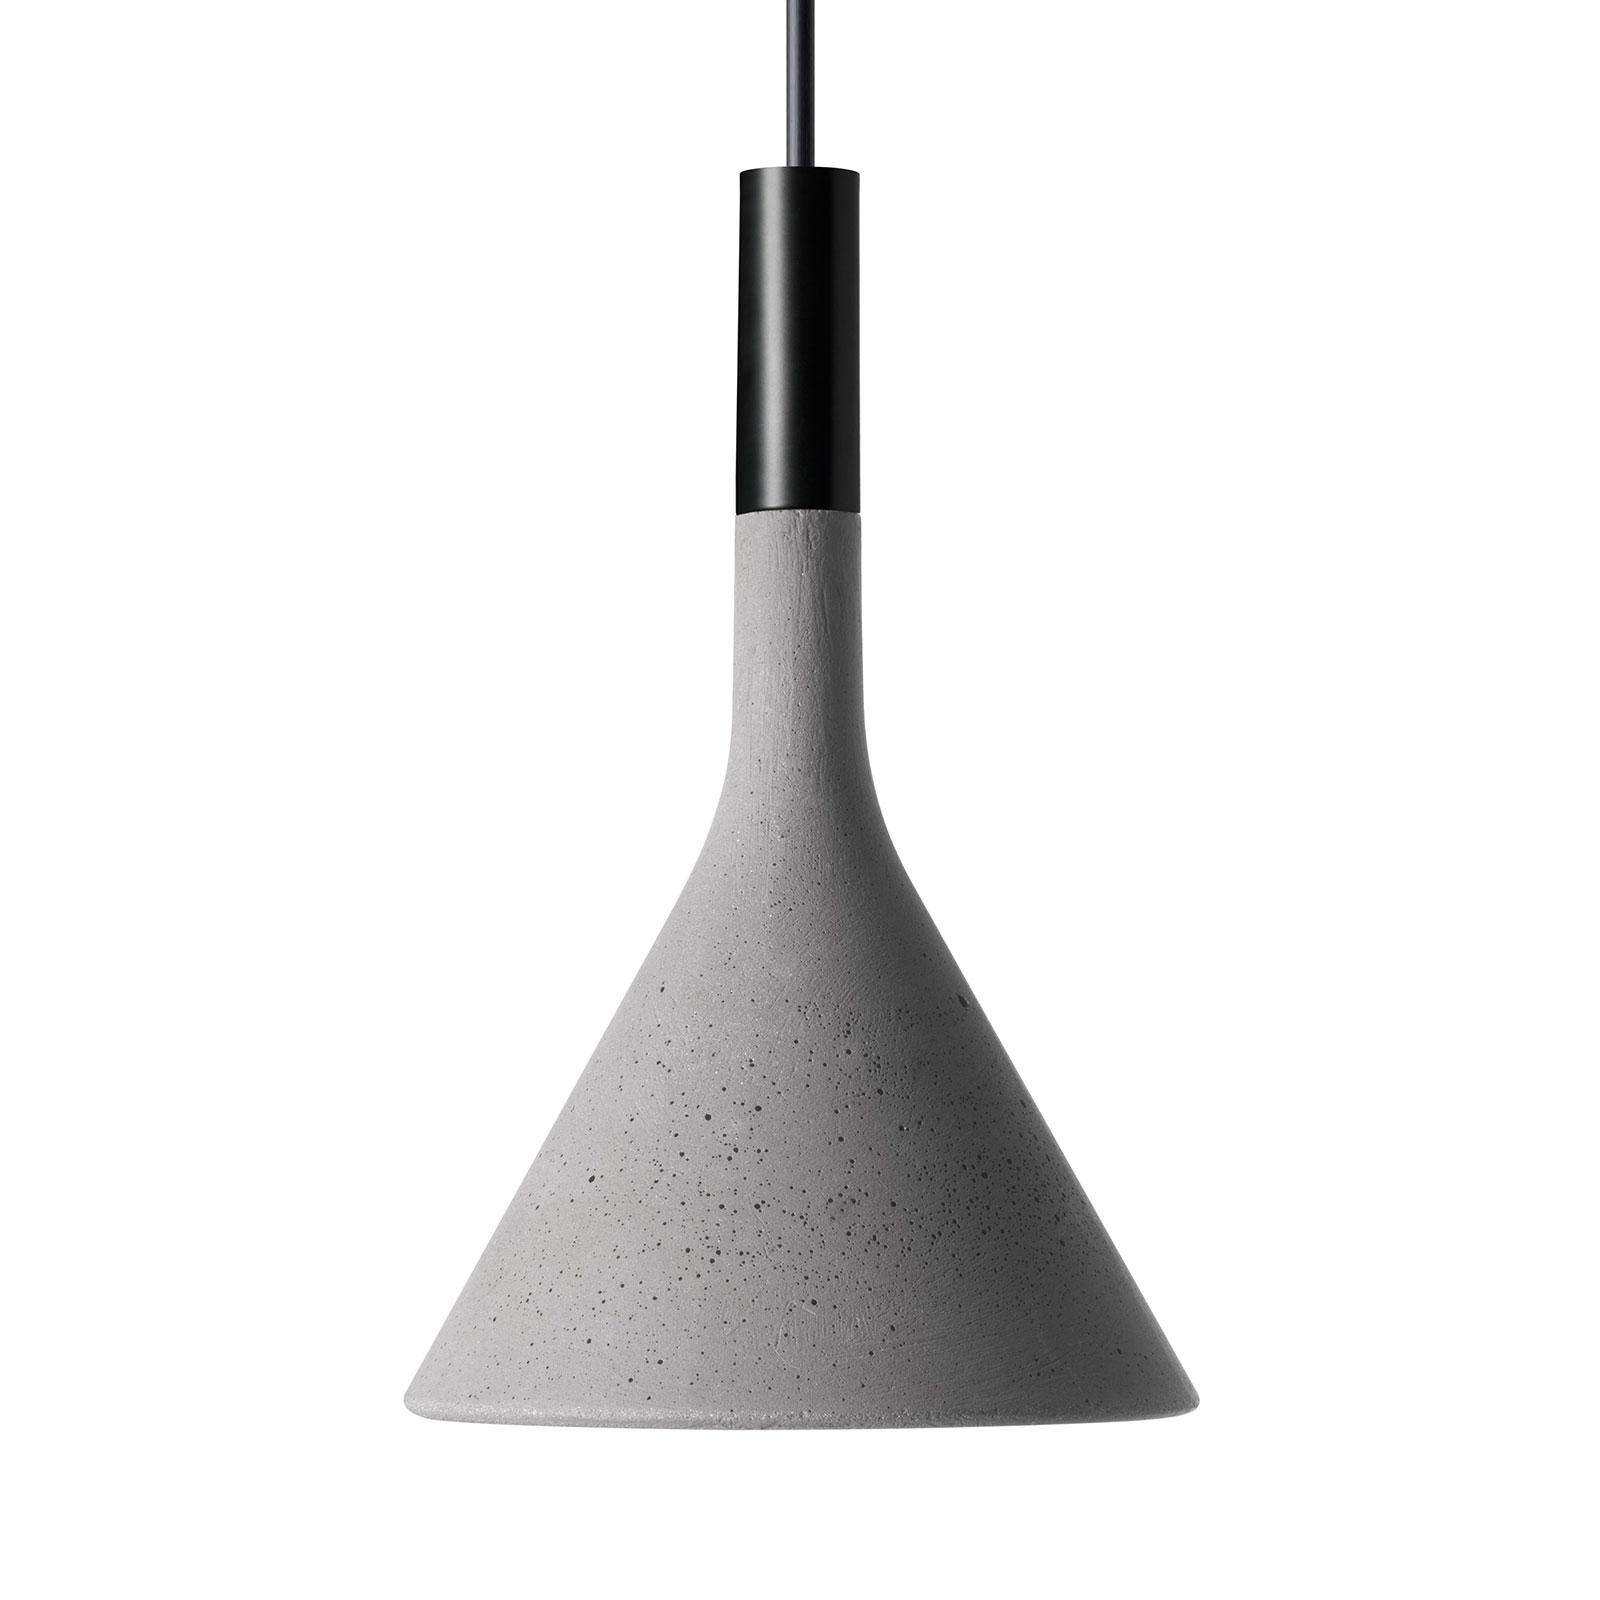 Foscarini Aplomb Mini hanglamp van beton, grijs